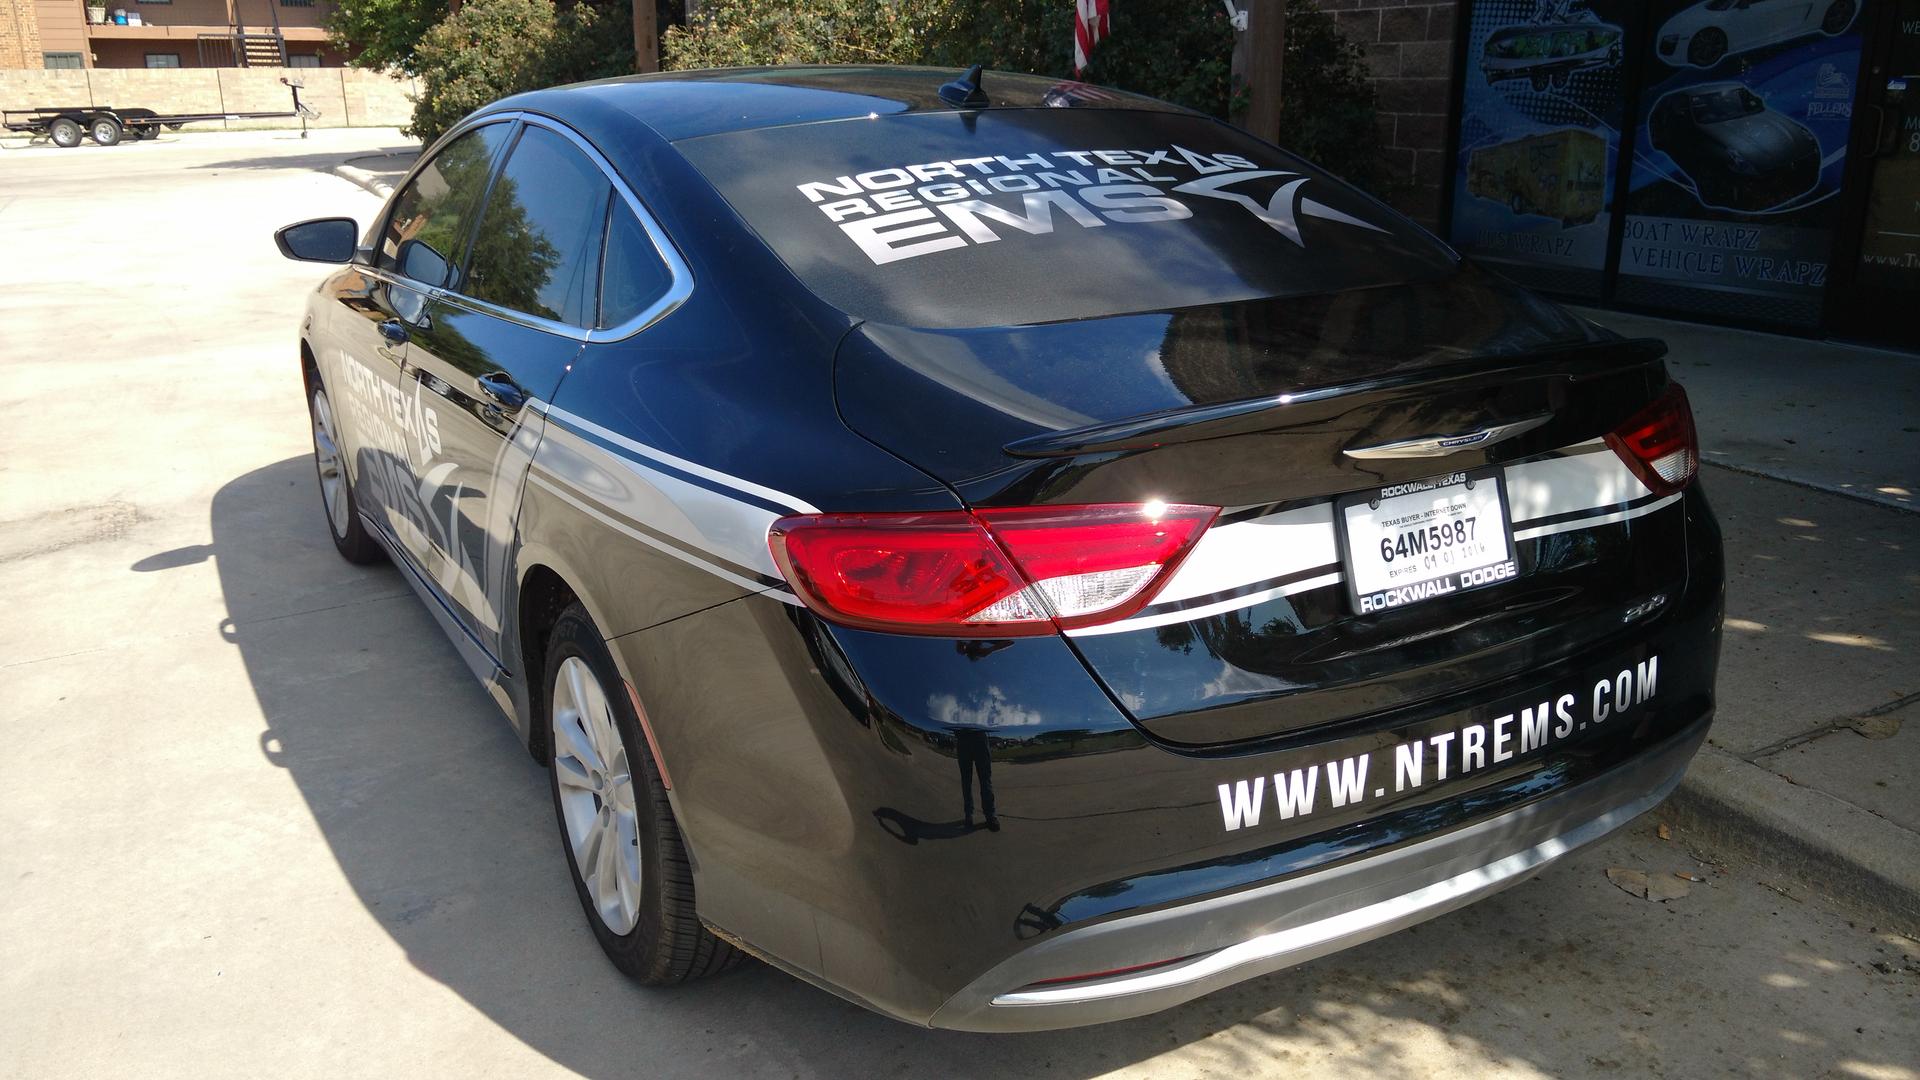 Cars Custom Car Wraps Custom Decals Vehicle Wraps Car Wraps - Custom decals for cars